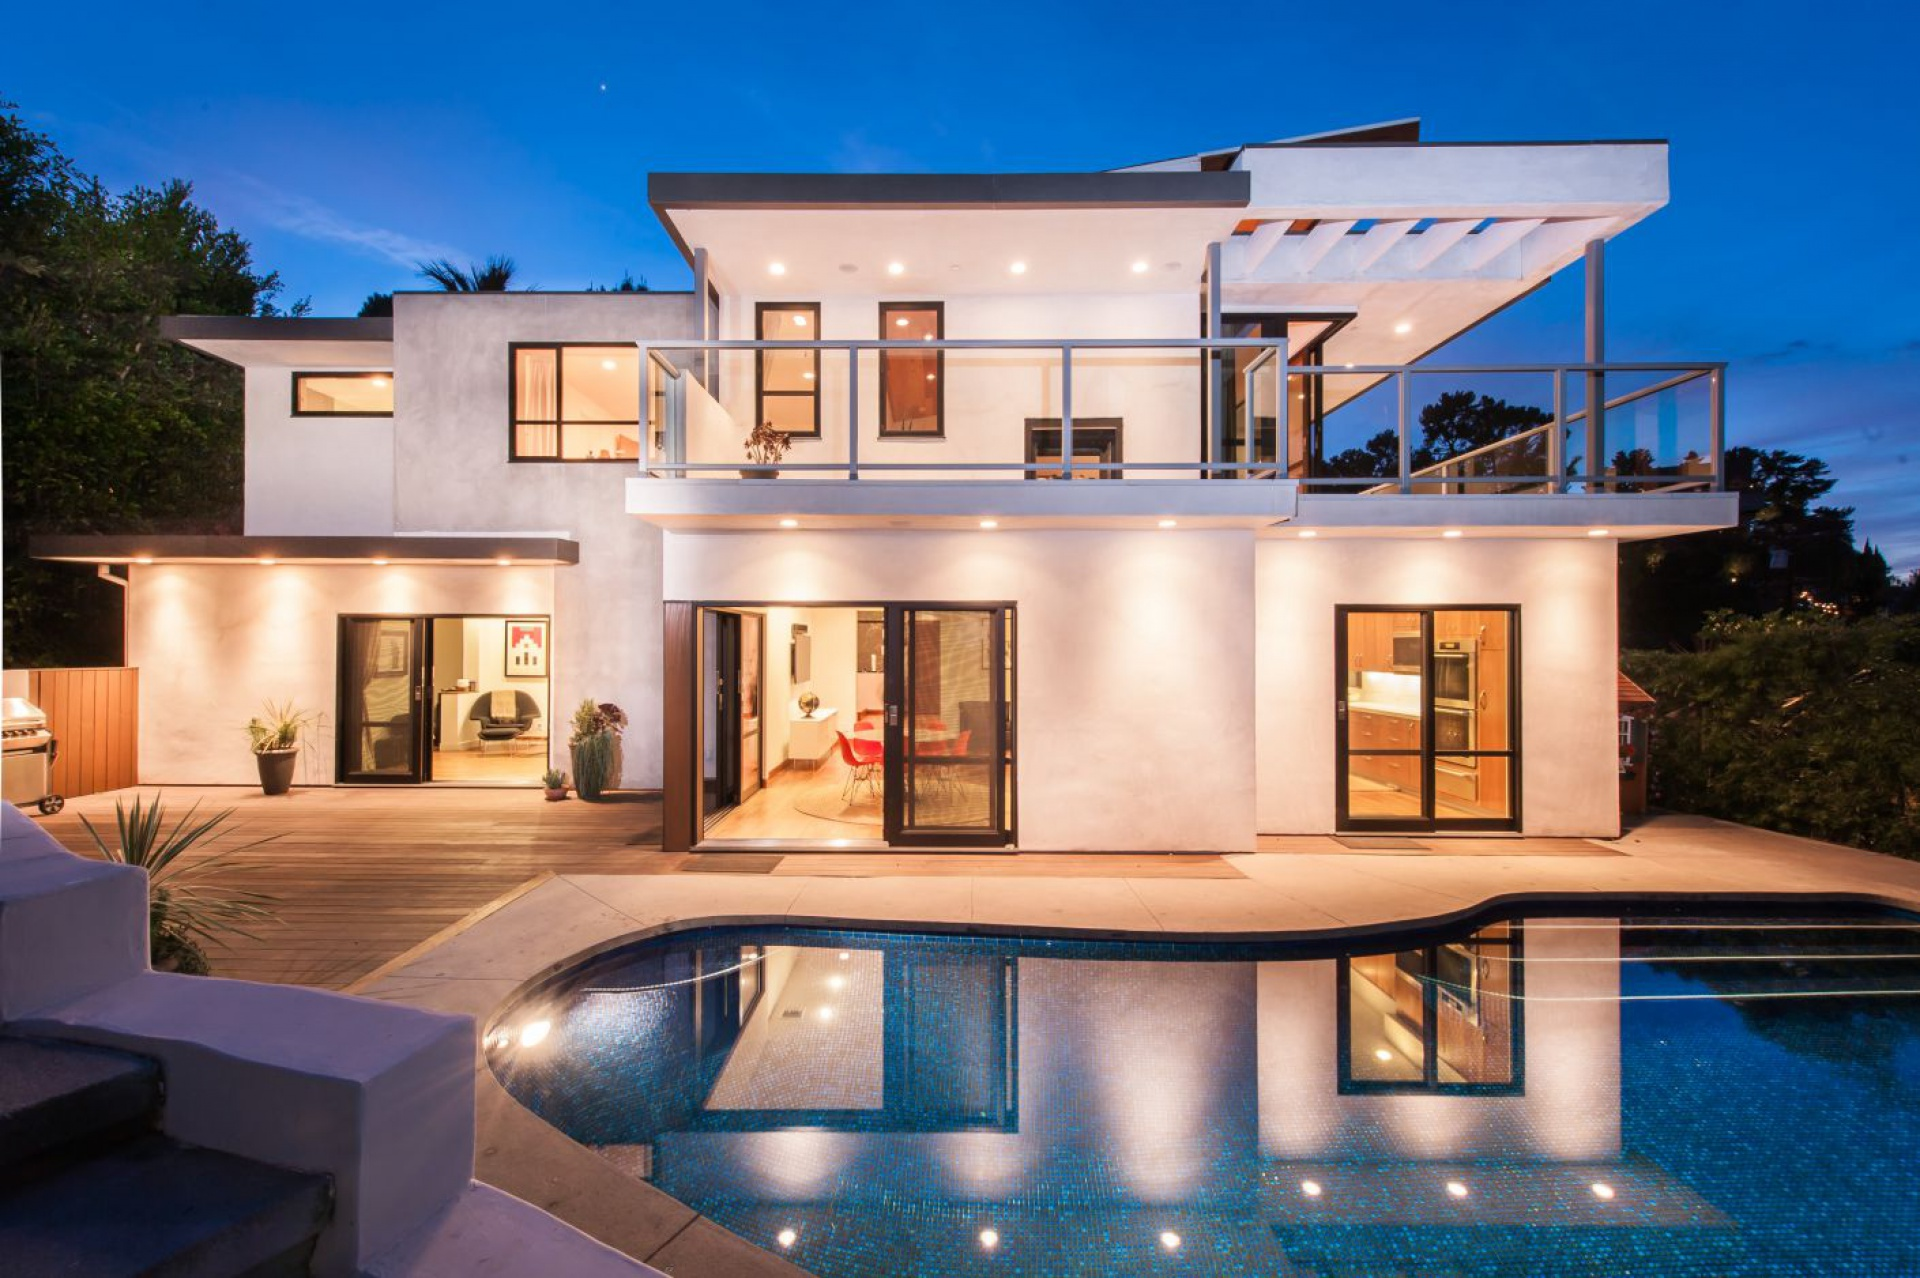 2160 Sunset Crest   |   Hollywood Hills  Laurel Canyon CA  | Jonah Wilson